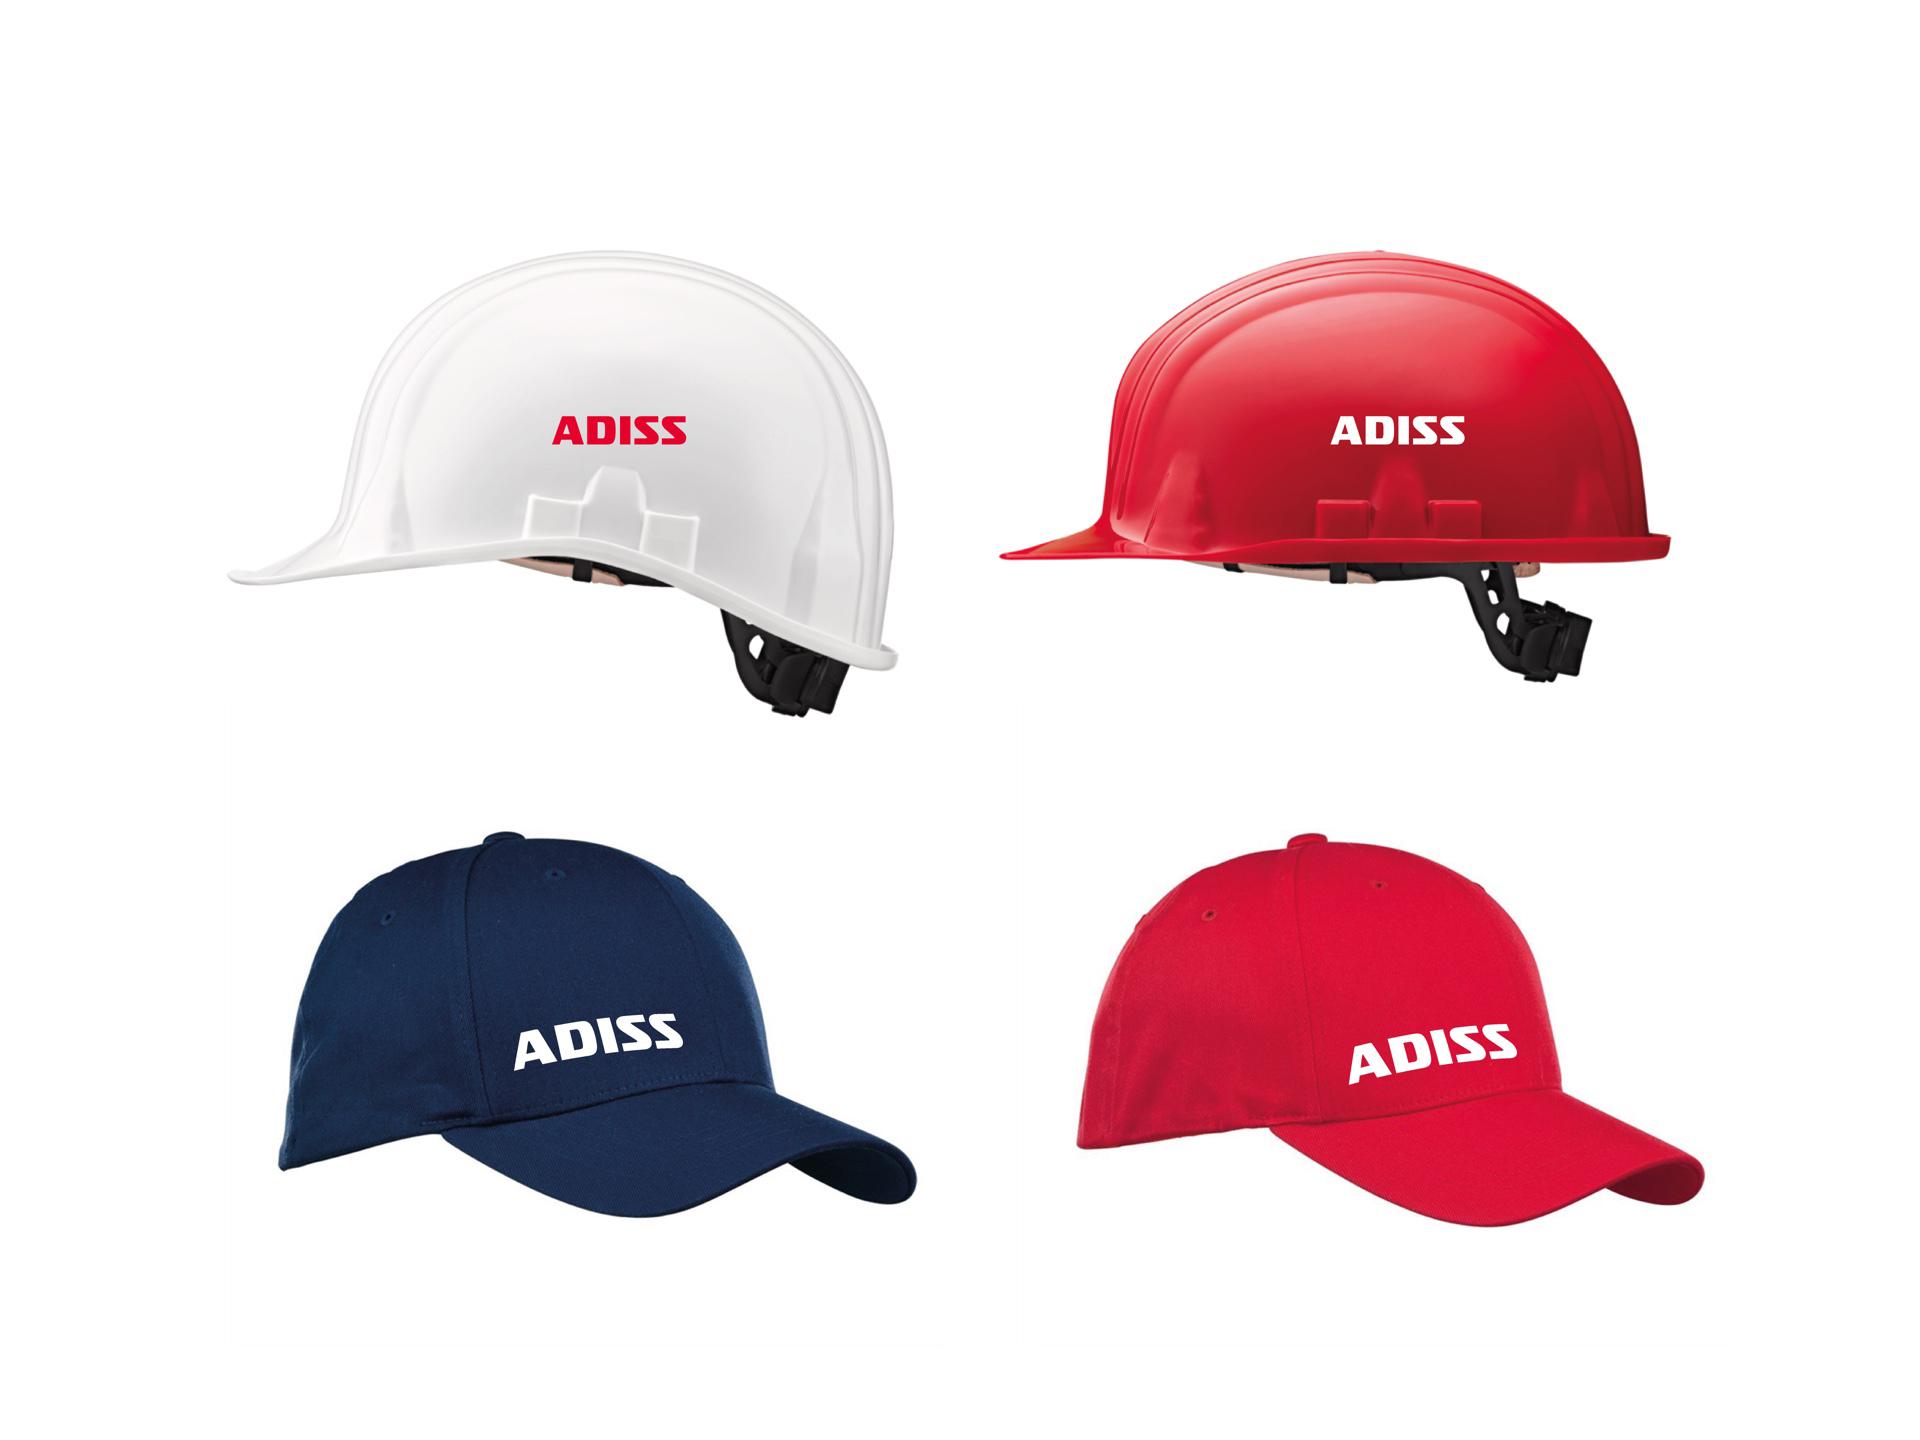 Adiss workwear 04.jpg